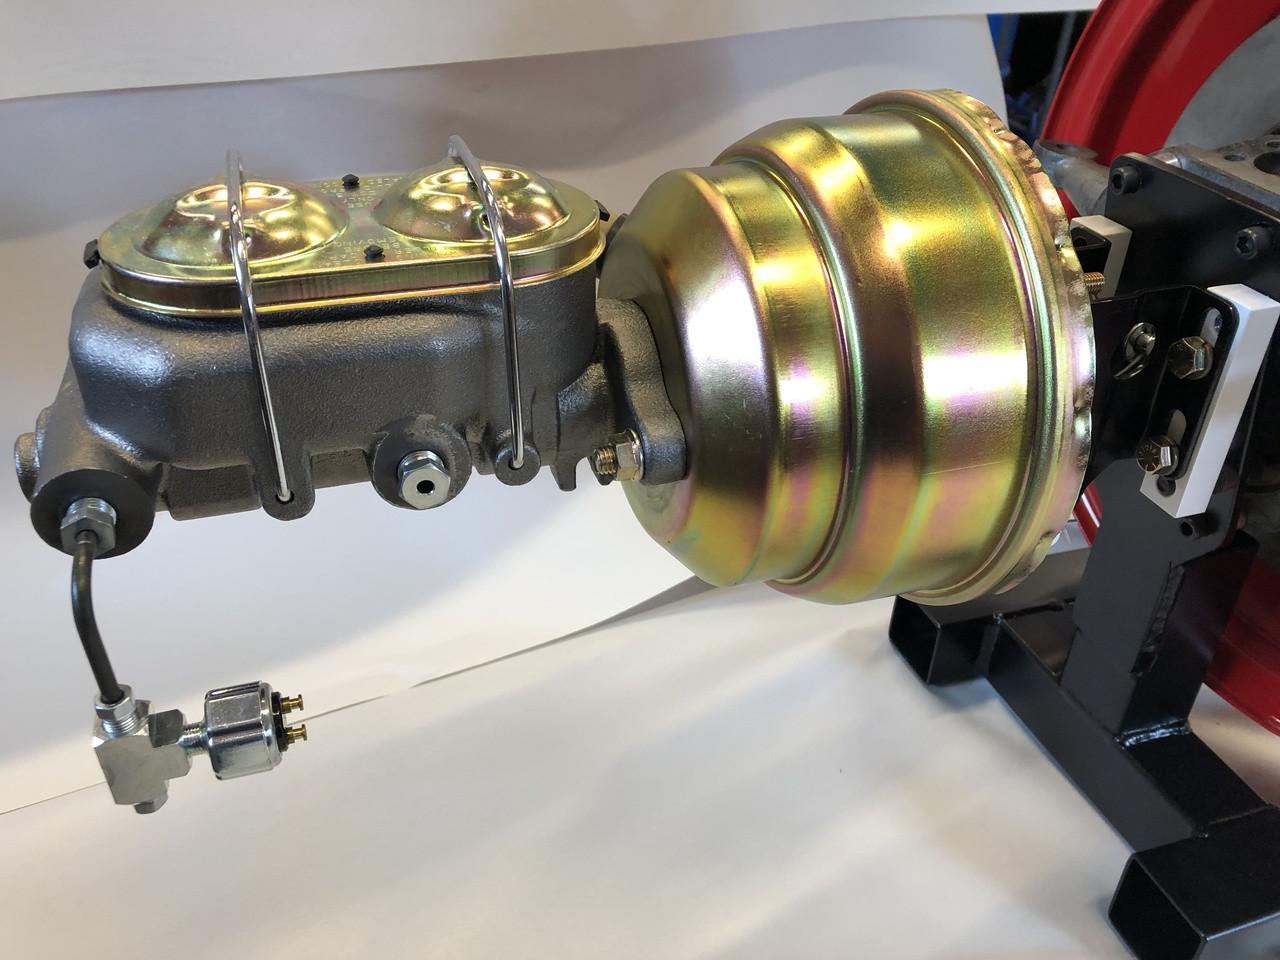 Power brakes (disc/drum)